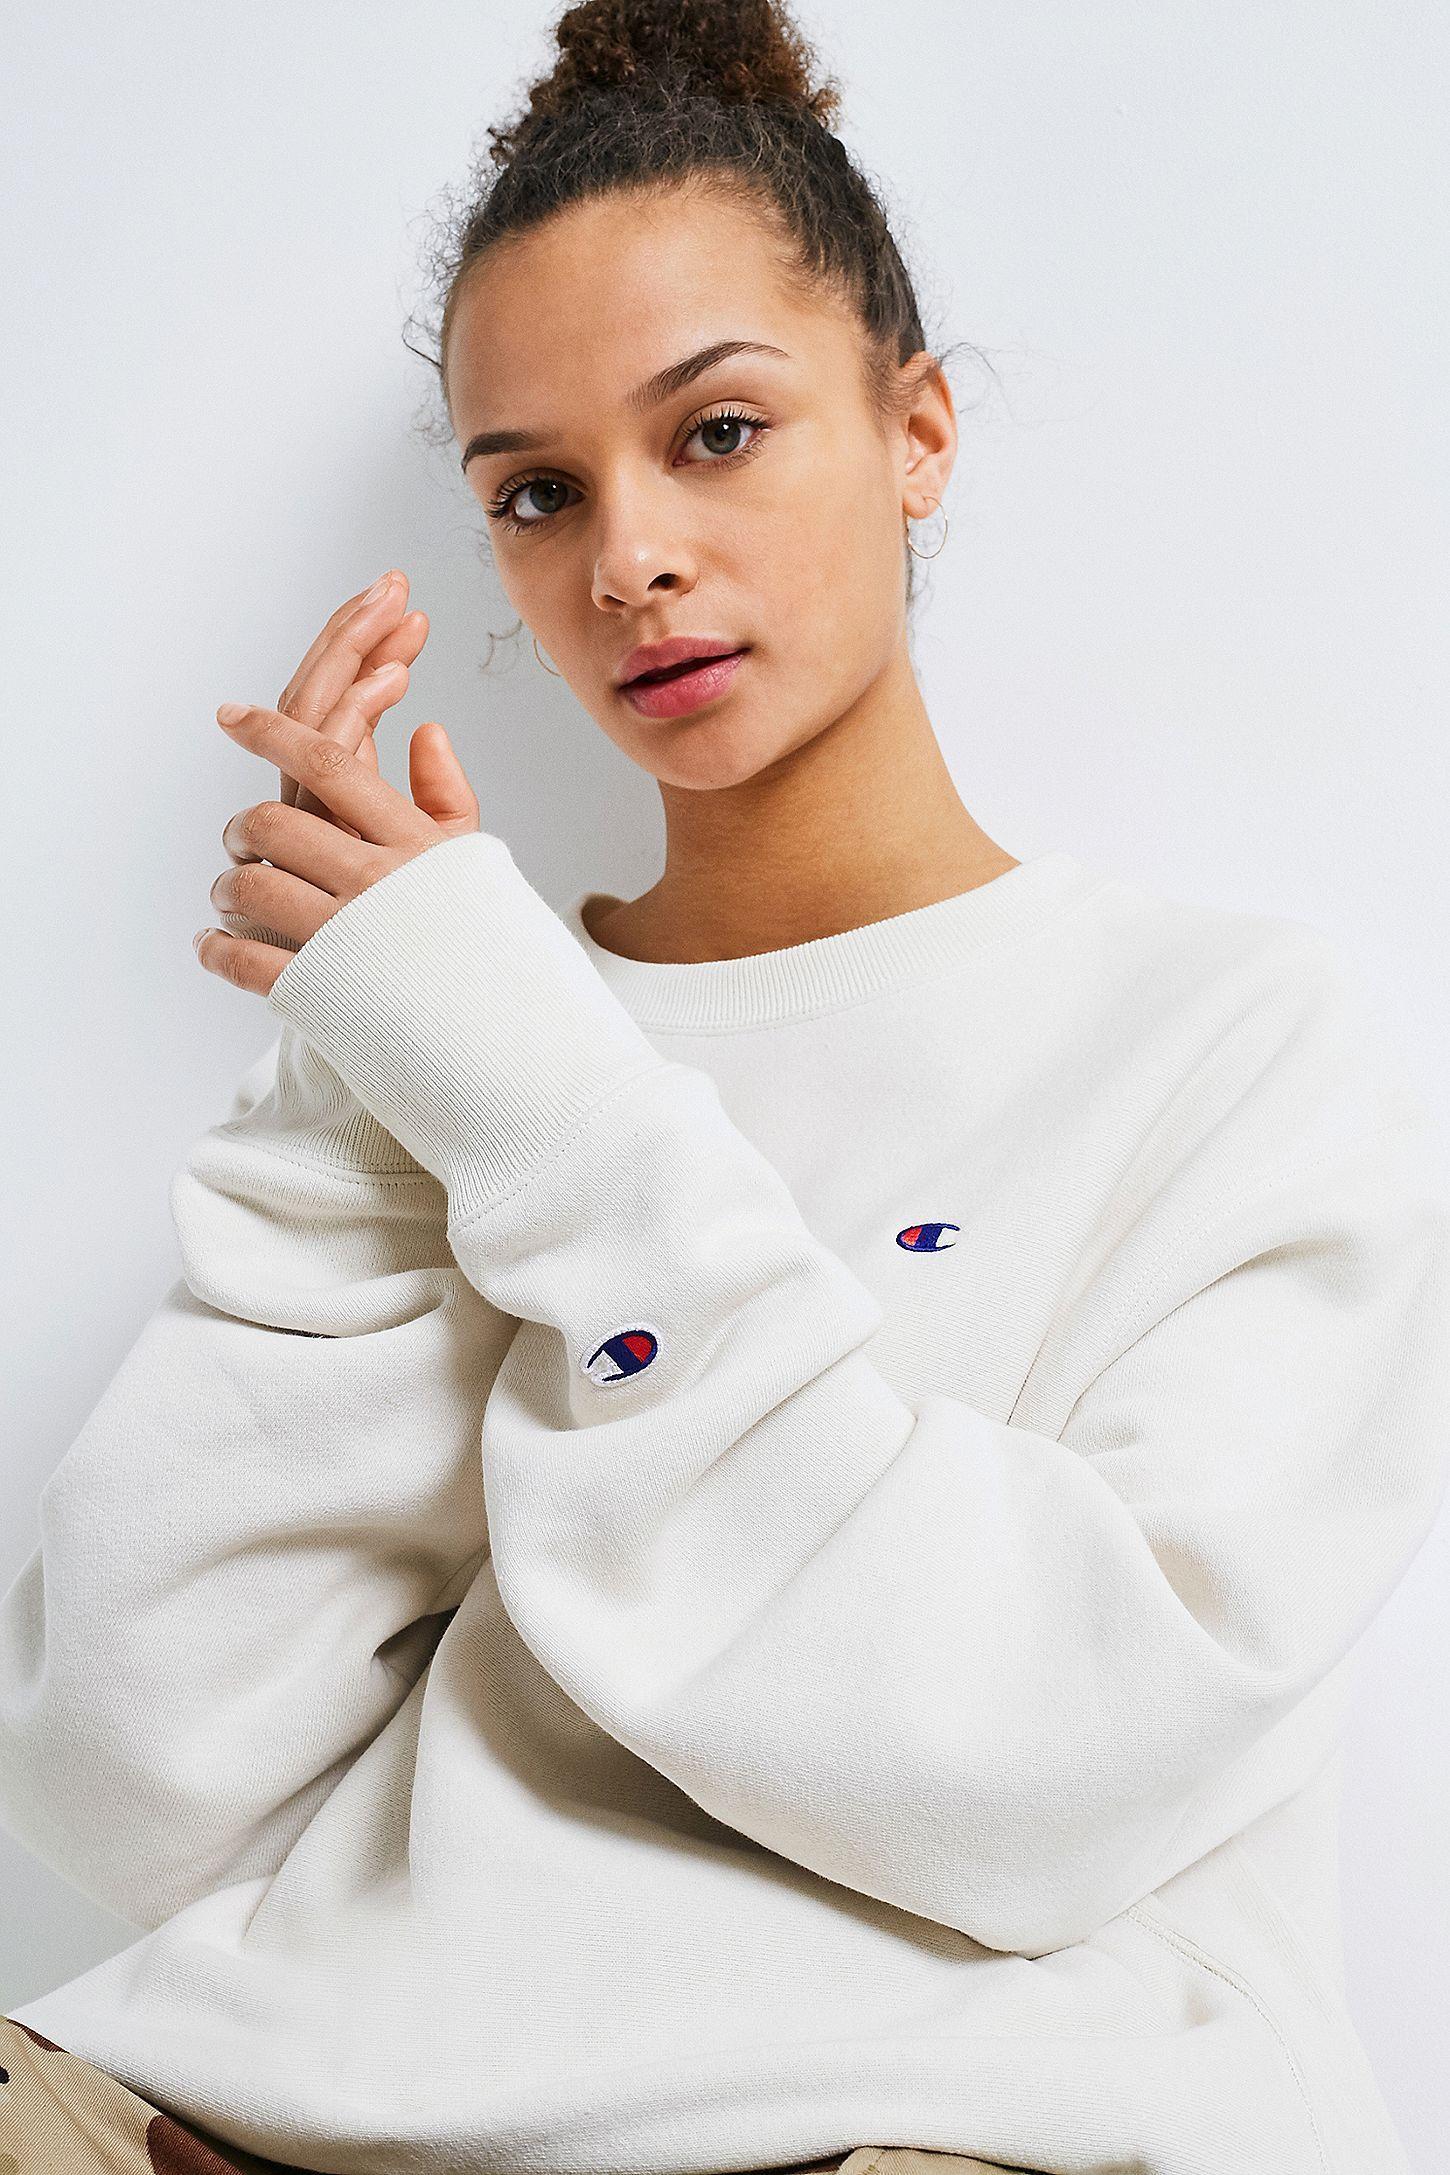 Champion S149 12 Oz Reverse Weave Fleece Crew Crew Neck Sweatshirt Oversized Crewneck Sportswear Fashion [ 2175 x 1450 Pixel ]